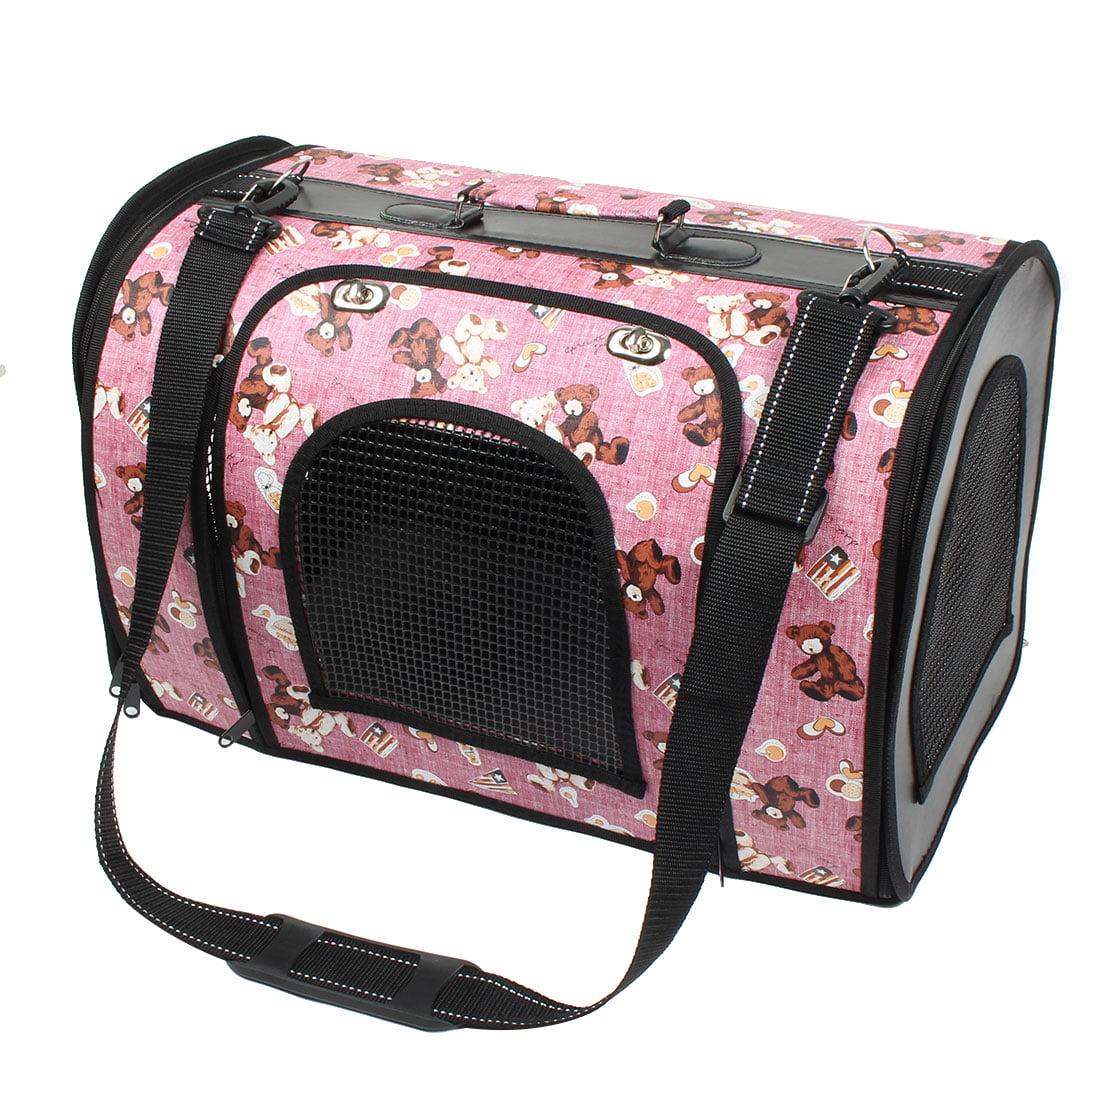 Travel Folding Bear Printed Meshy Zipper Pet Dog Carrier Cage Bag 47x26x33cm